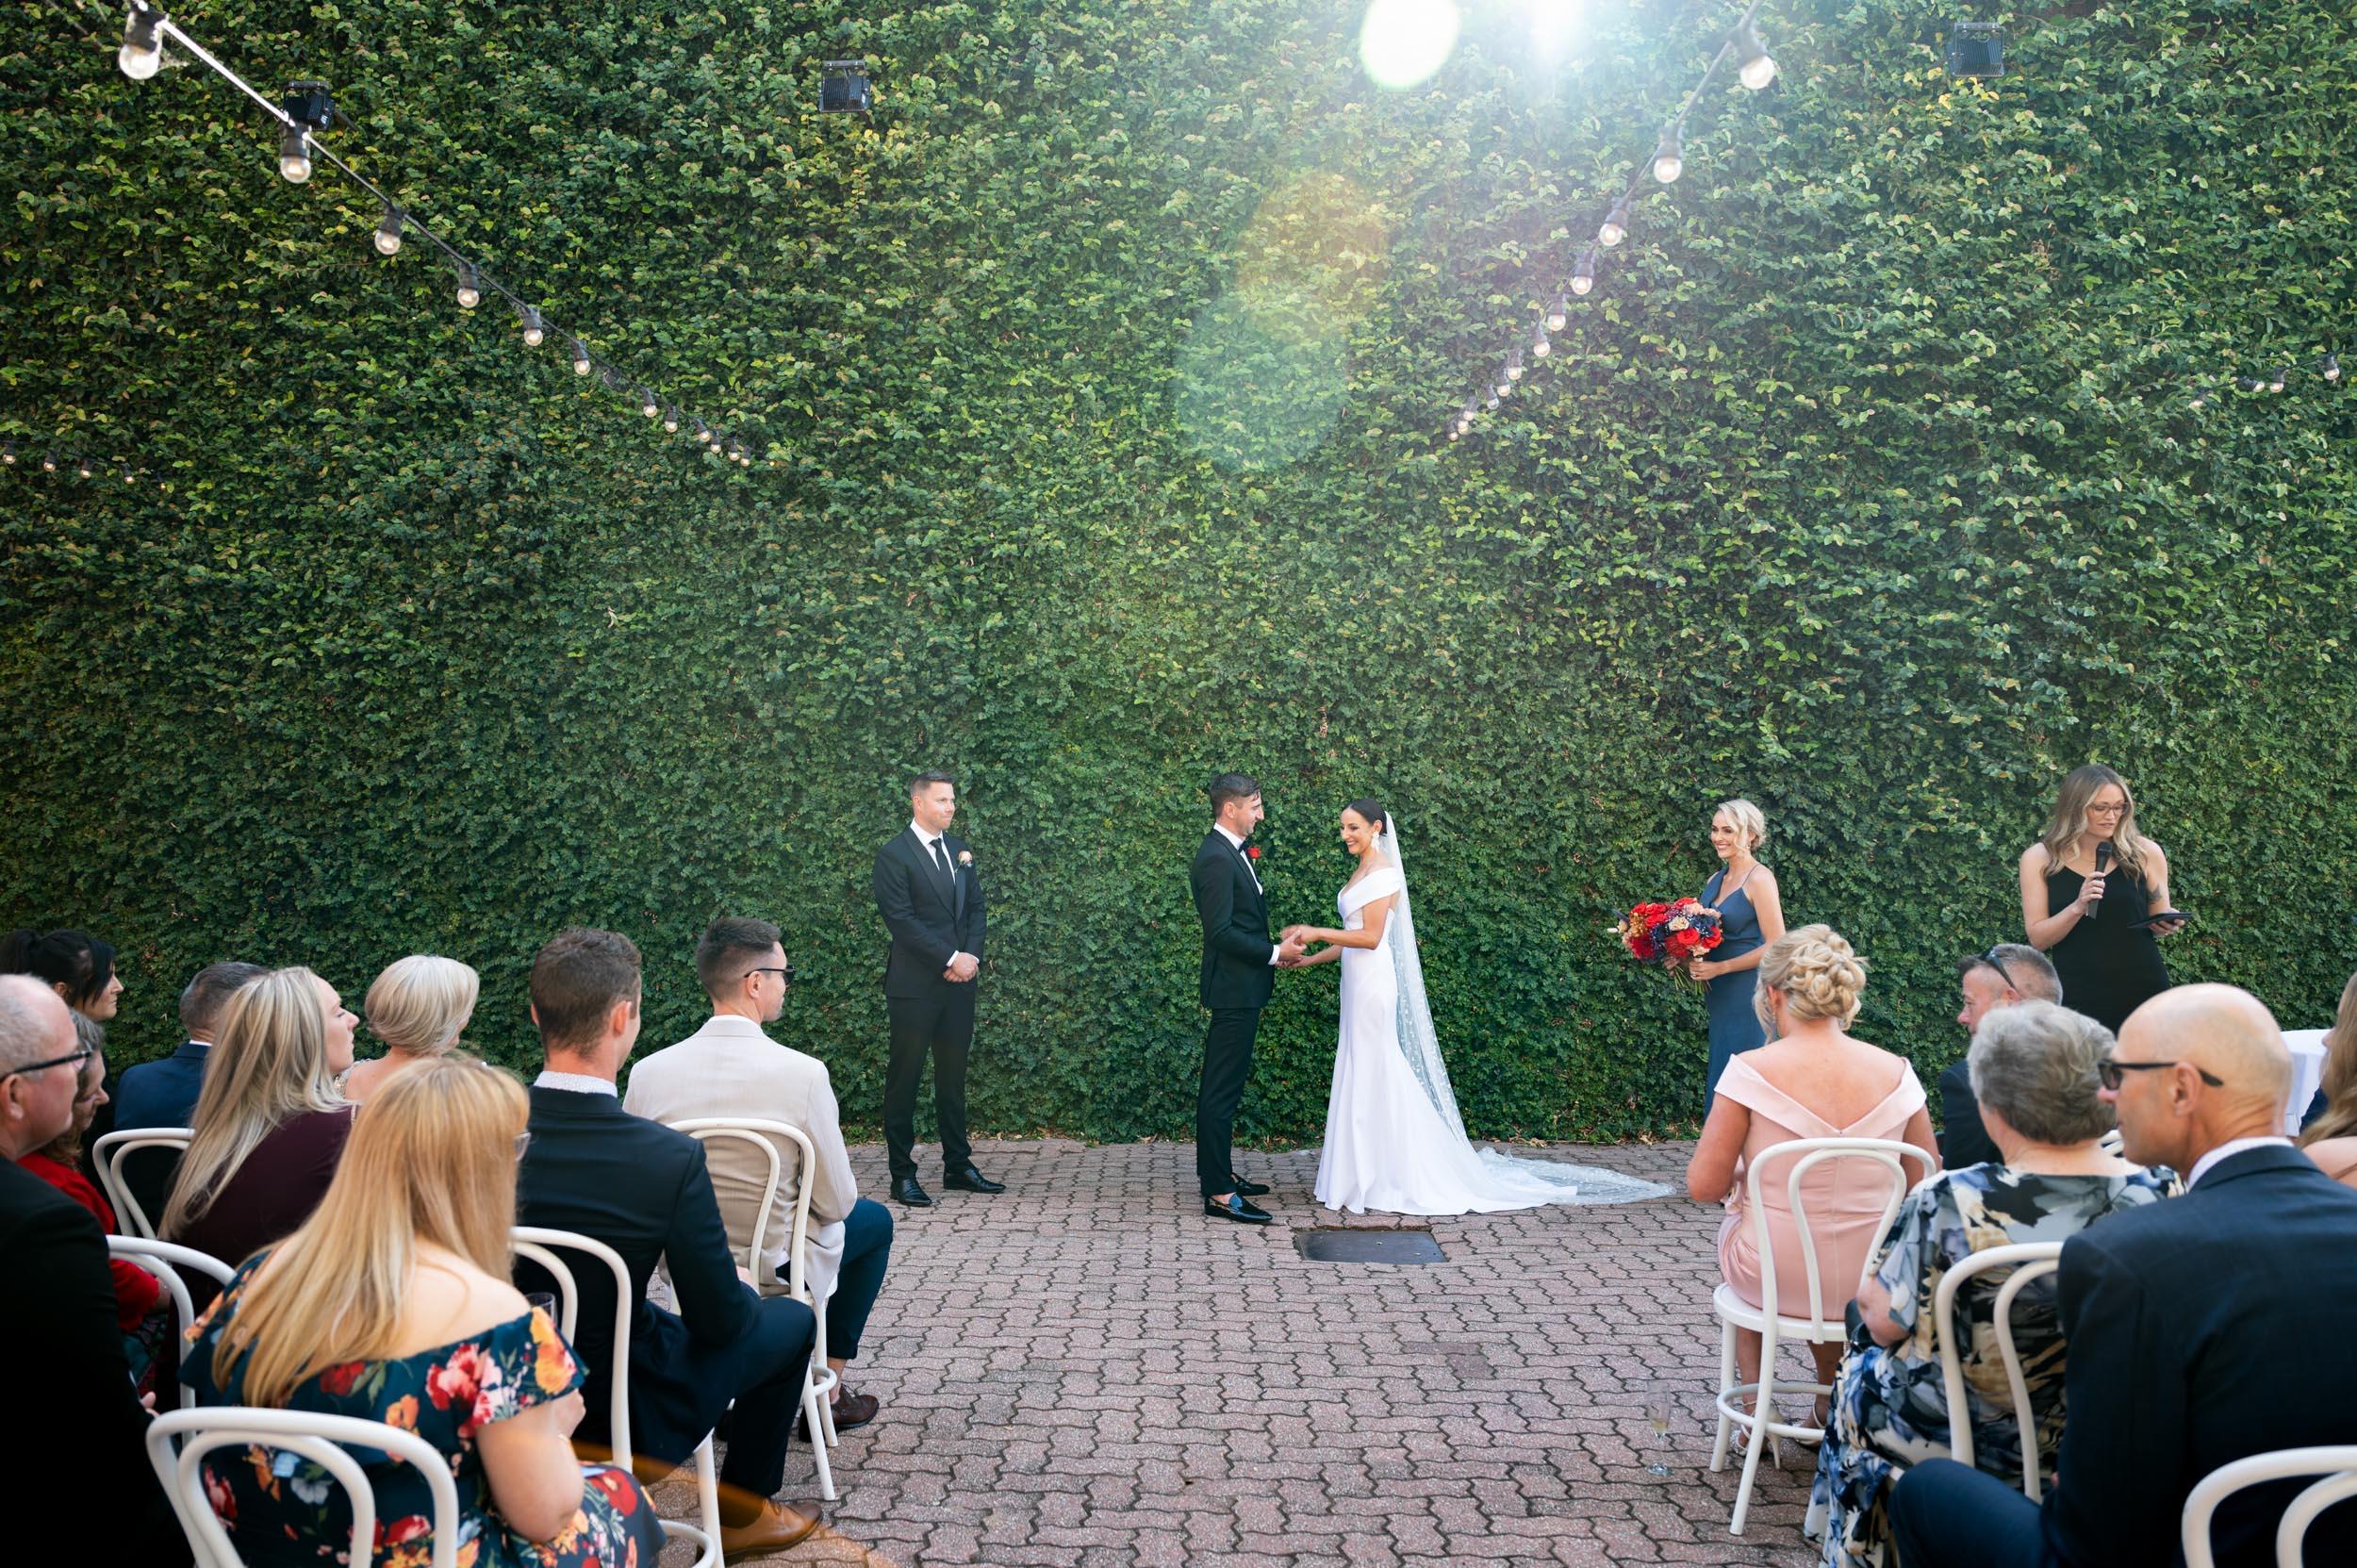 Wedding Day, Butler Lane Richmond, Butler Lane by Peter Rowland, Sun flare, Wedding ceremony, Melbourne Wedding